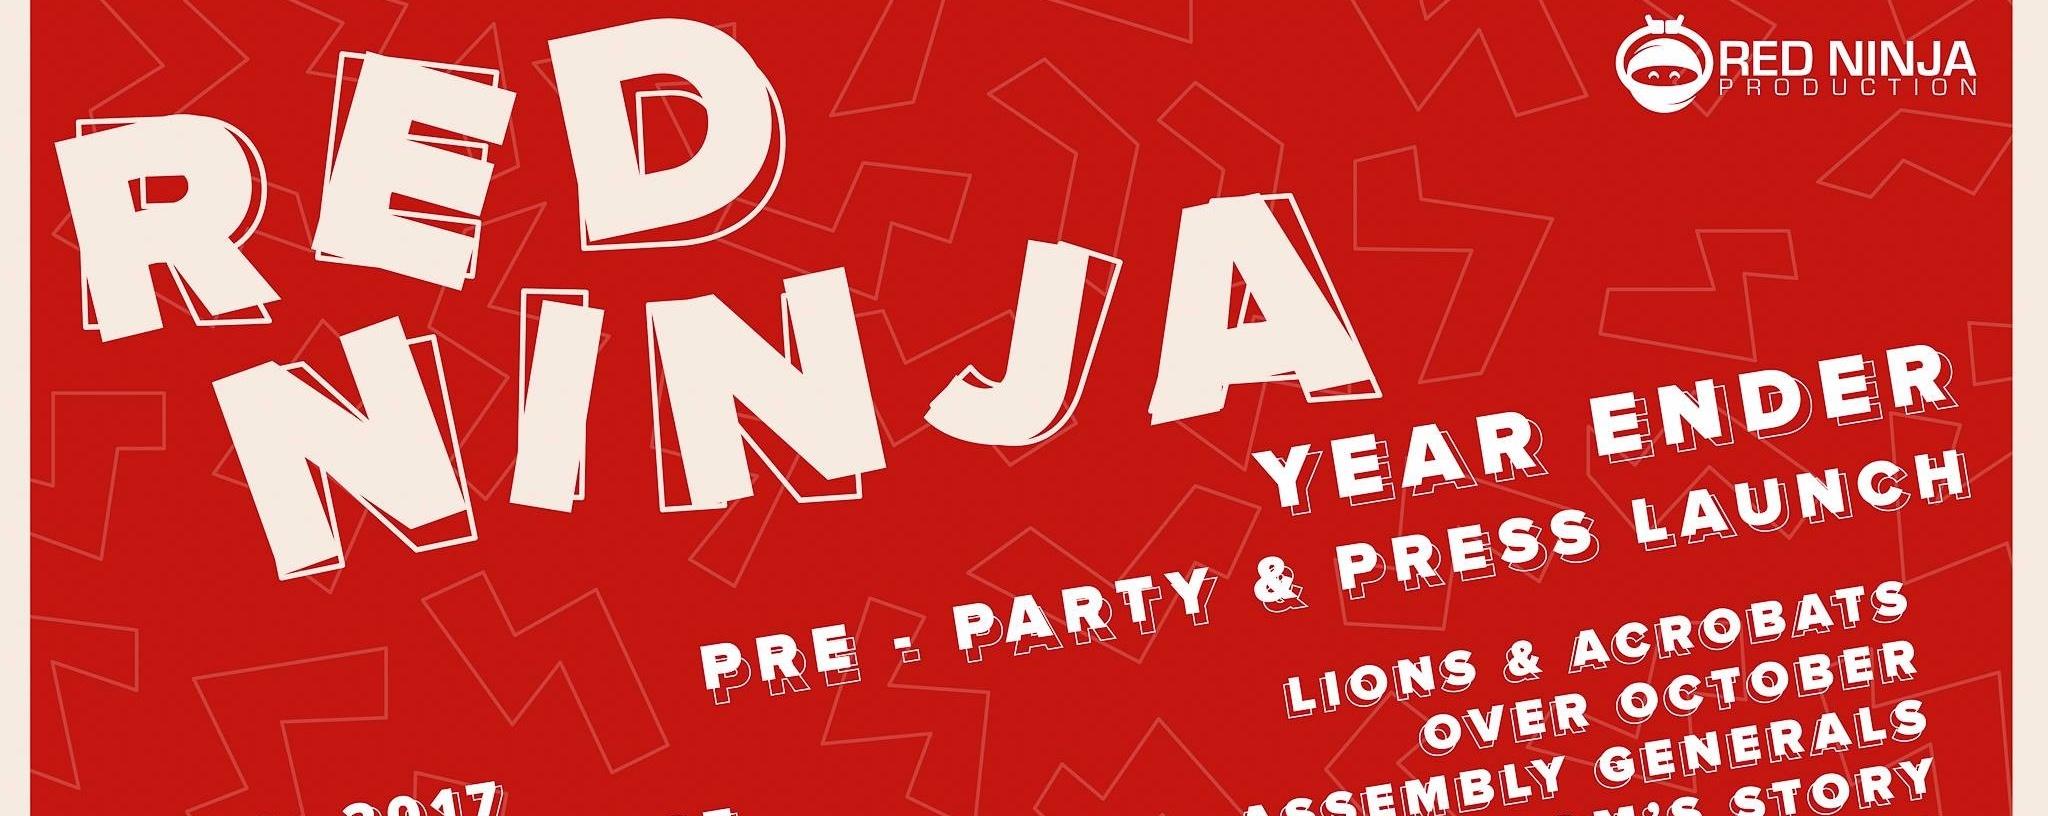 Red Ninja Year Ender Pre Party!